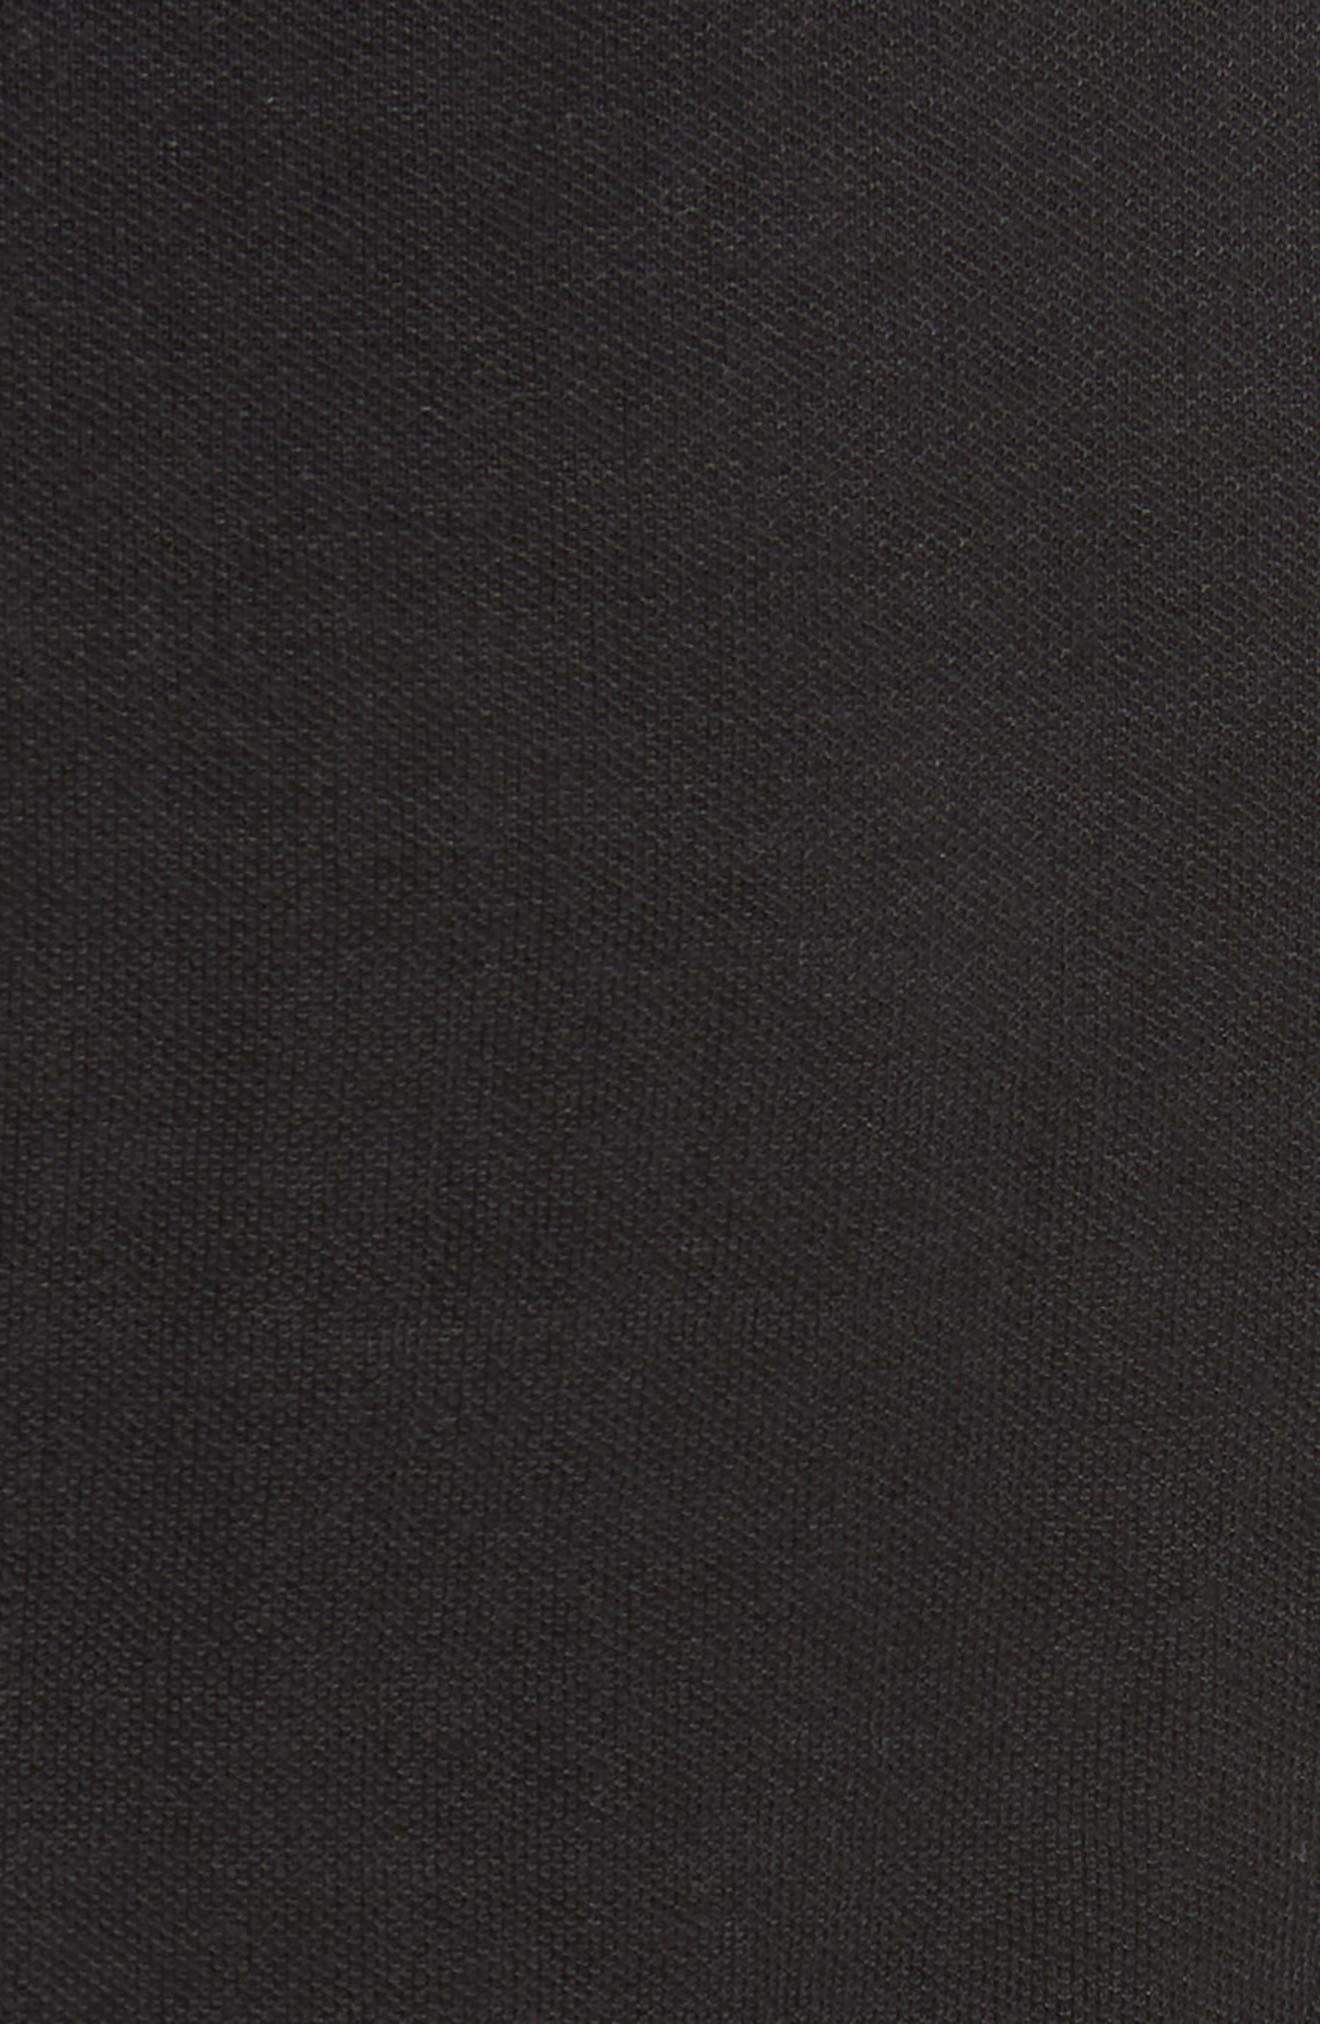 Knit Moto Jacket,                             Alternate thumbnail 6, color,                             001